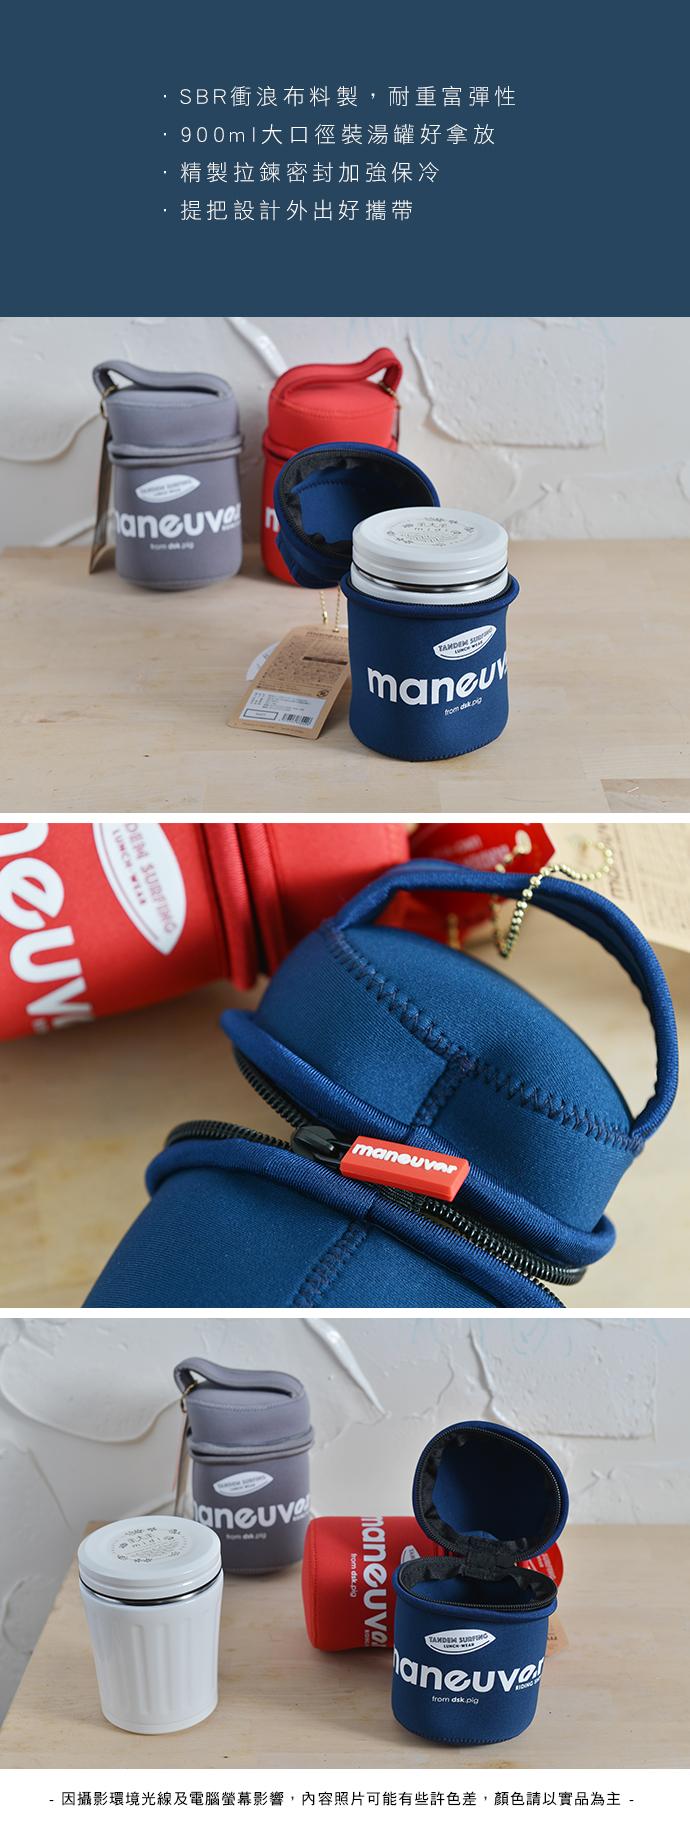 CB Japan|海洋系列保冷手提湯袋 - 時尚灰